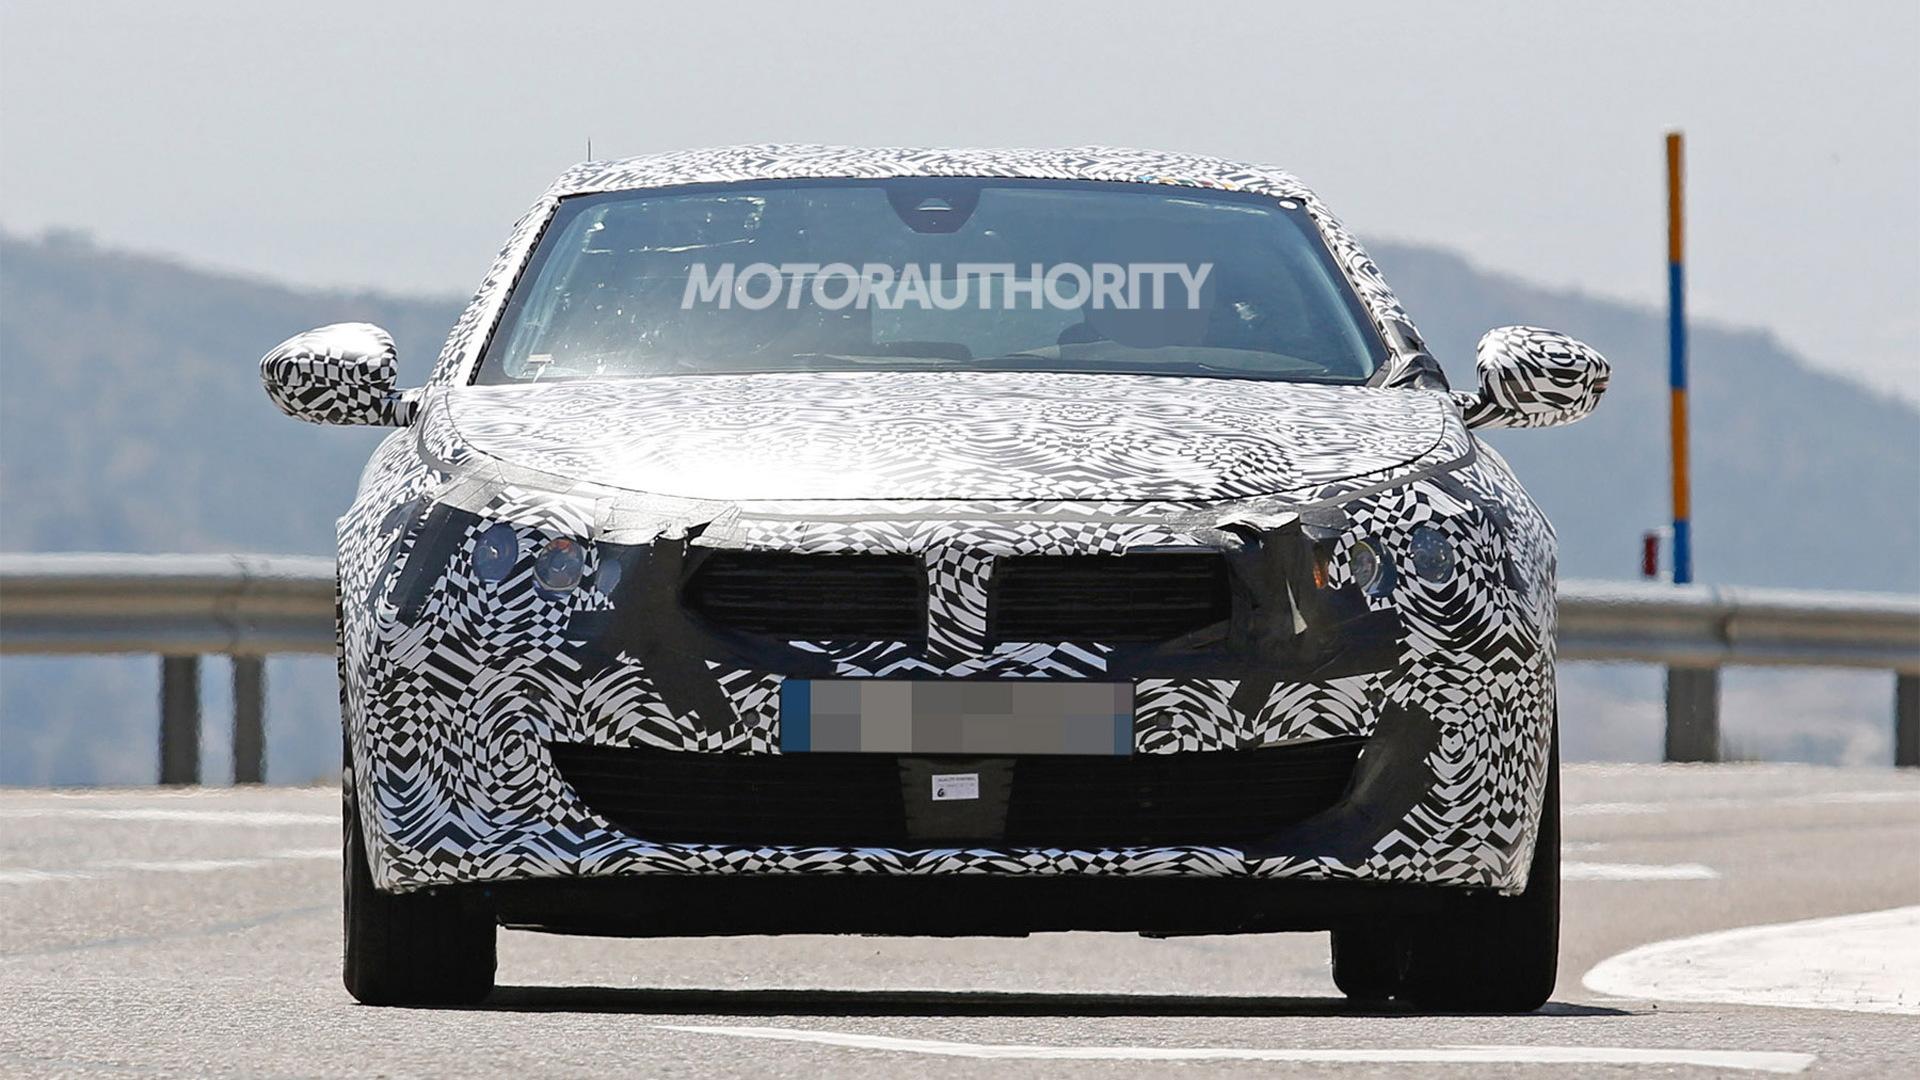 2018 Peugeot 508 spy shots - Image via S. Baldauf/SB-Medien